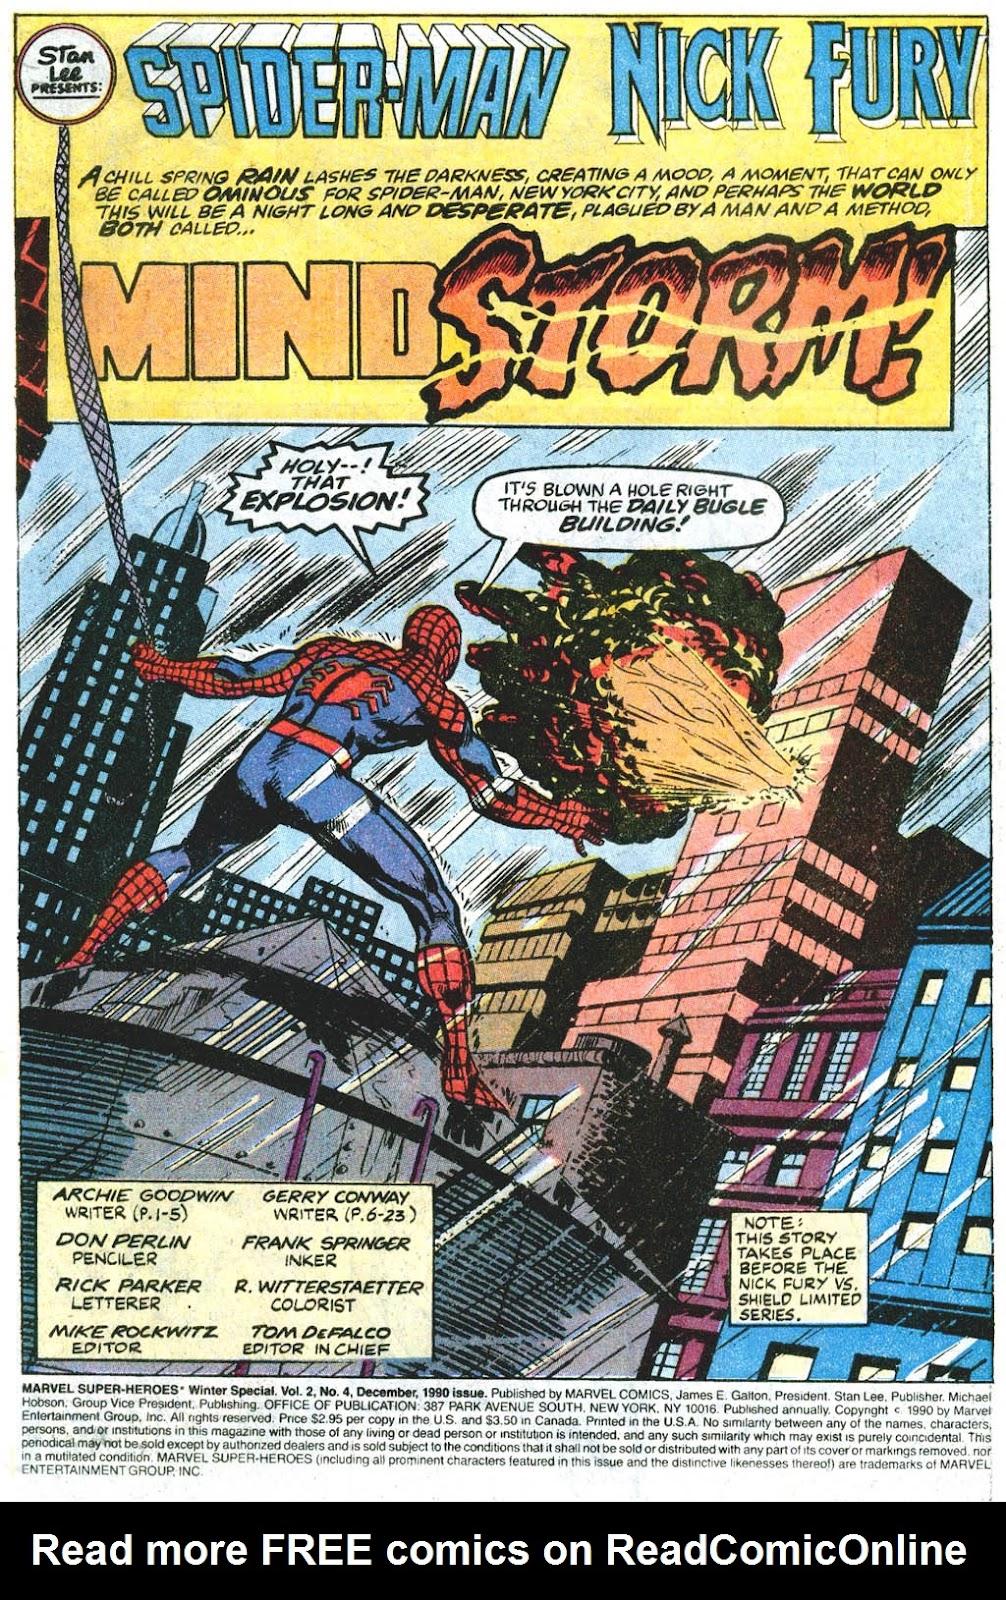 Marvel Super-Heroes (1990) 4 Page 2